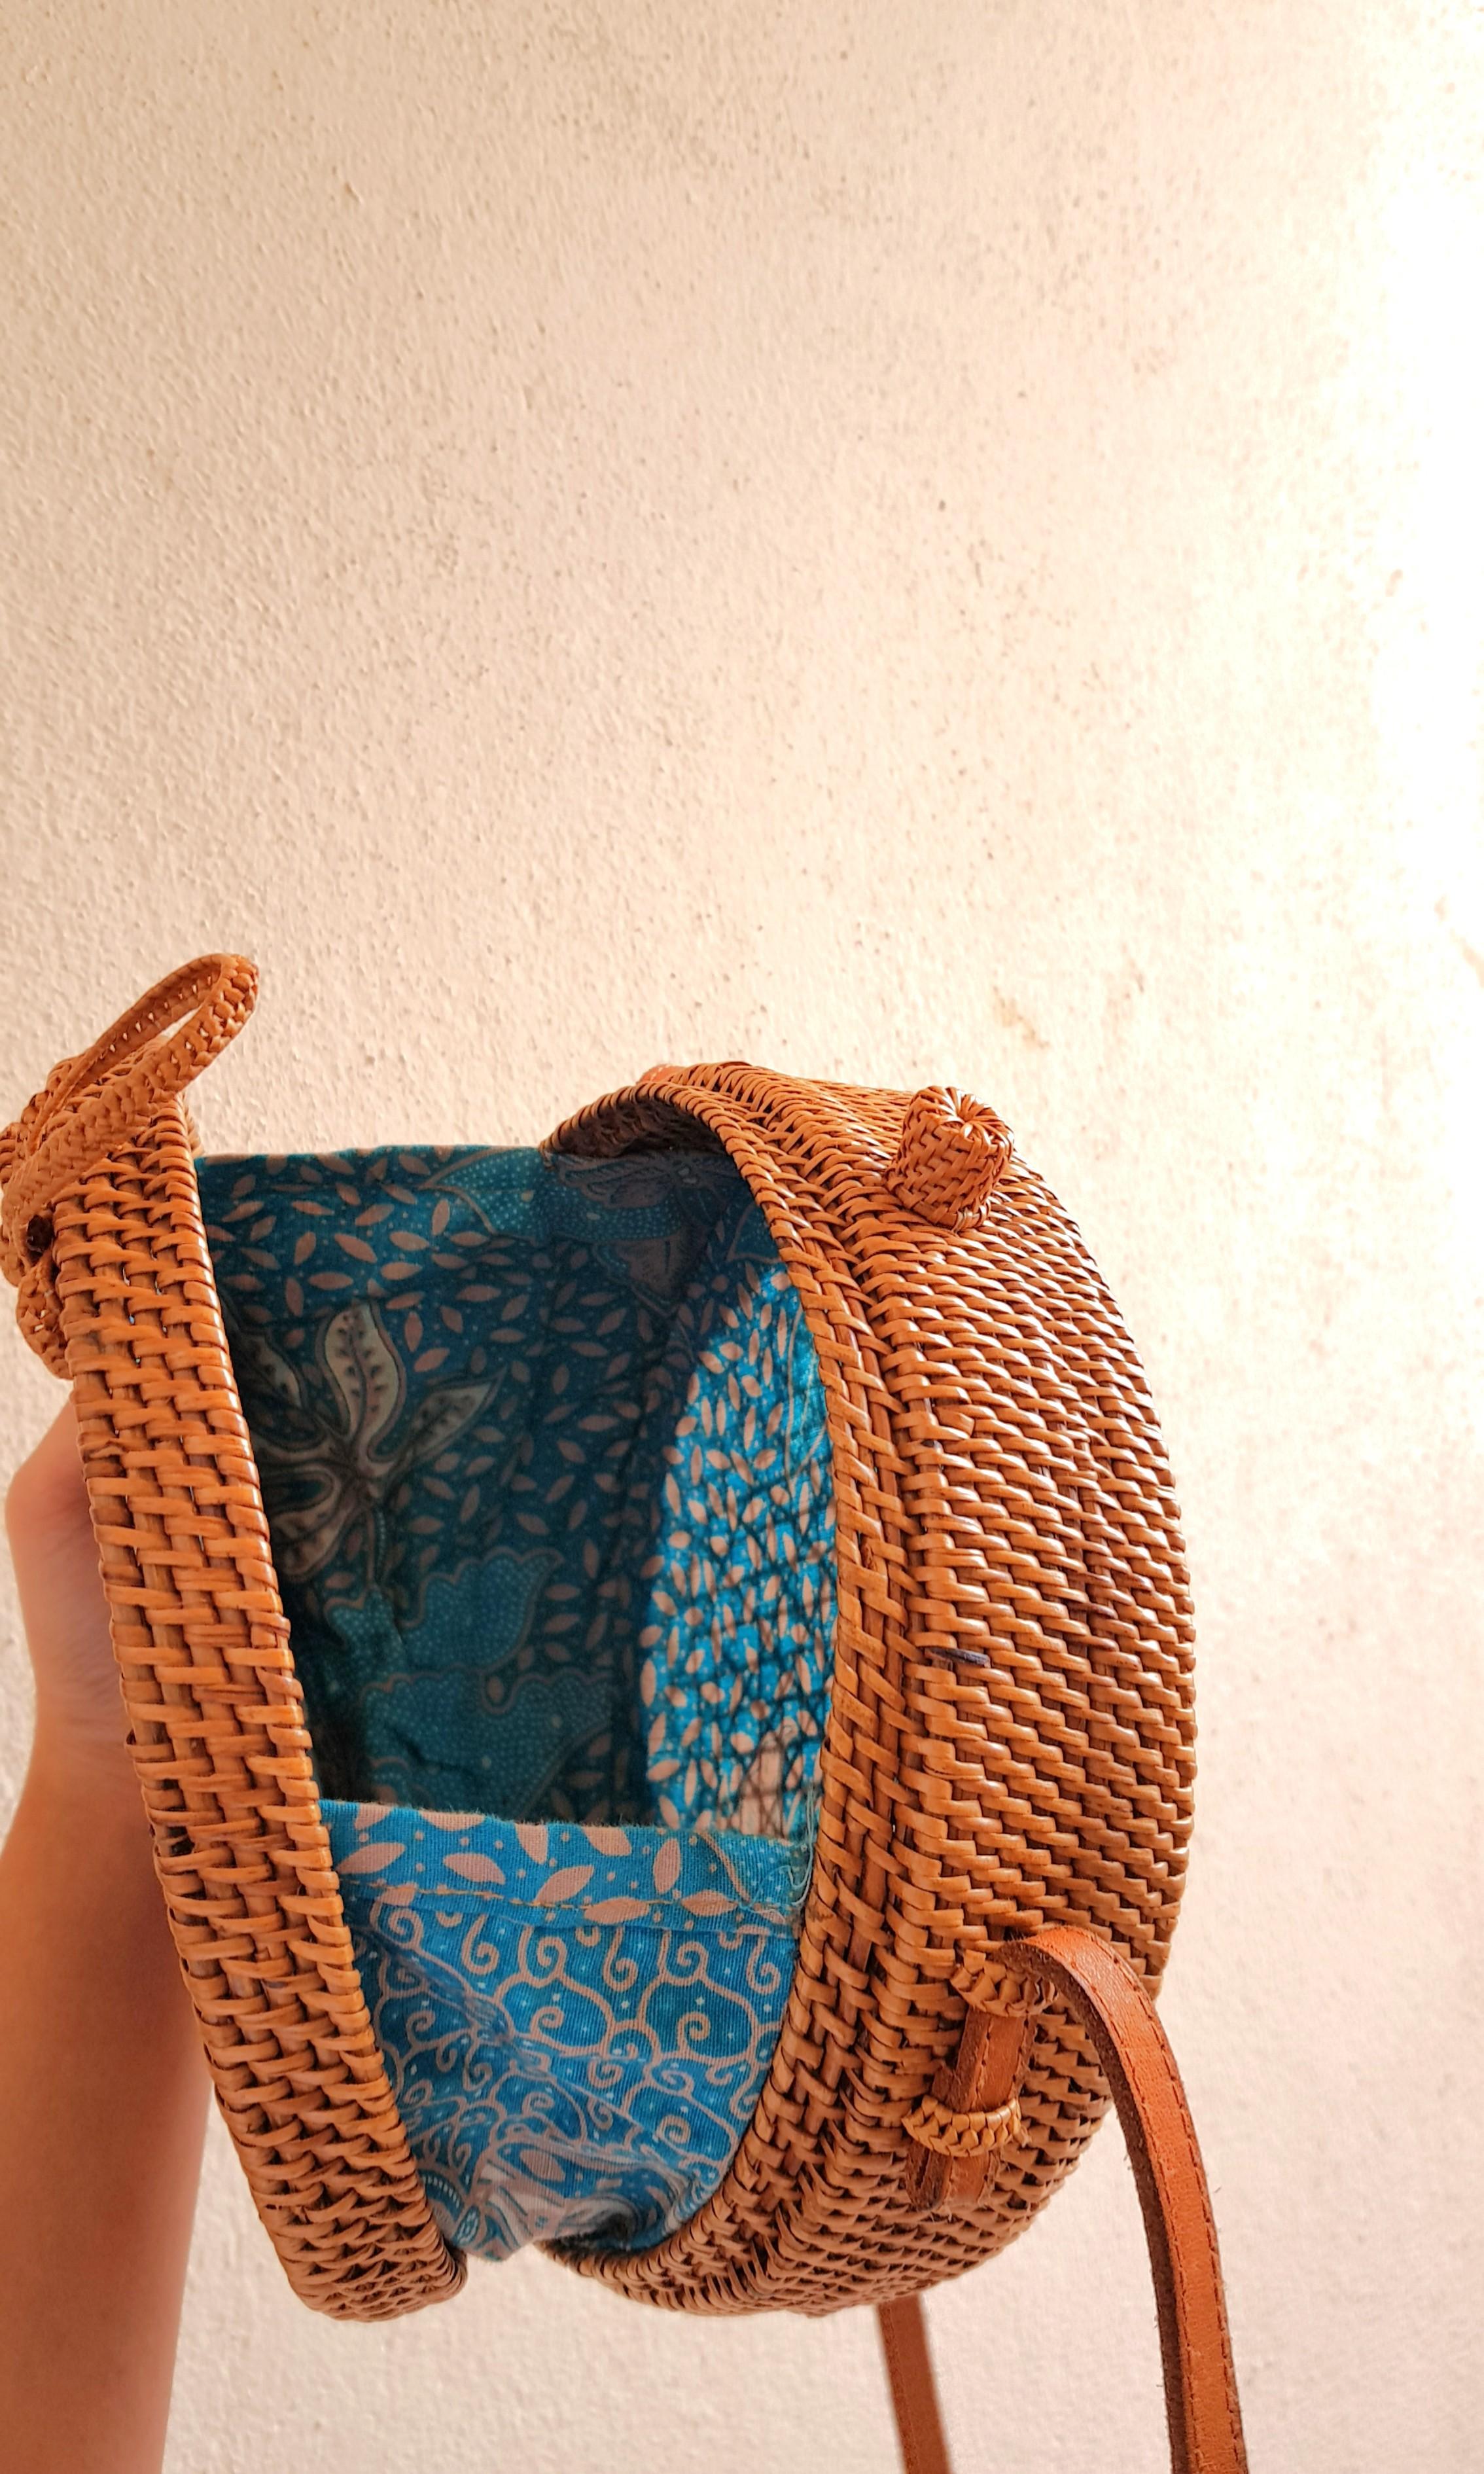 Rattan Bag Price Markdown